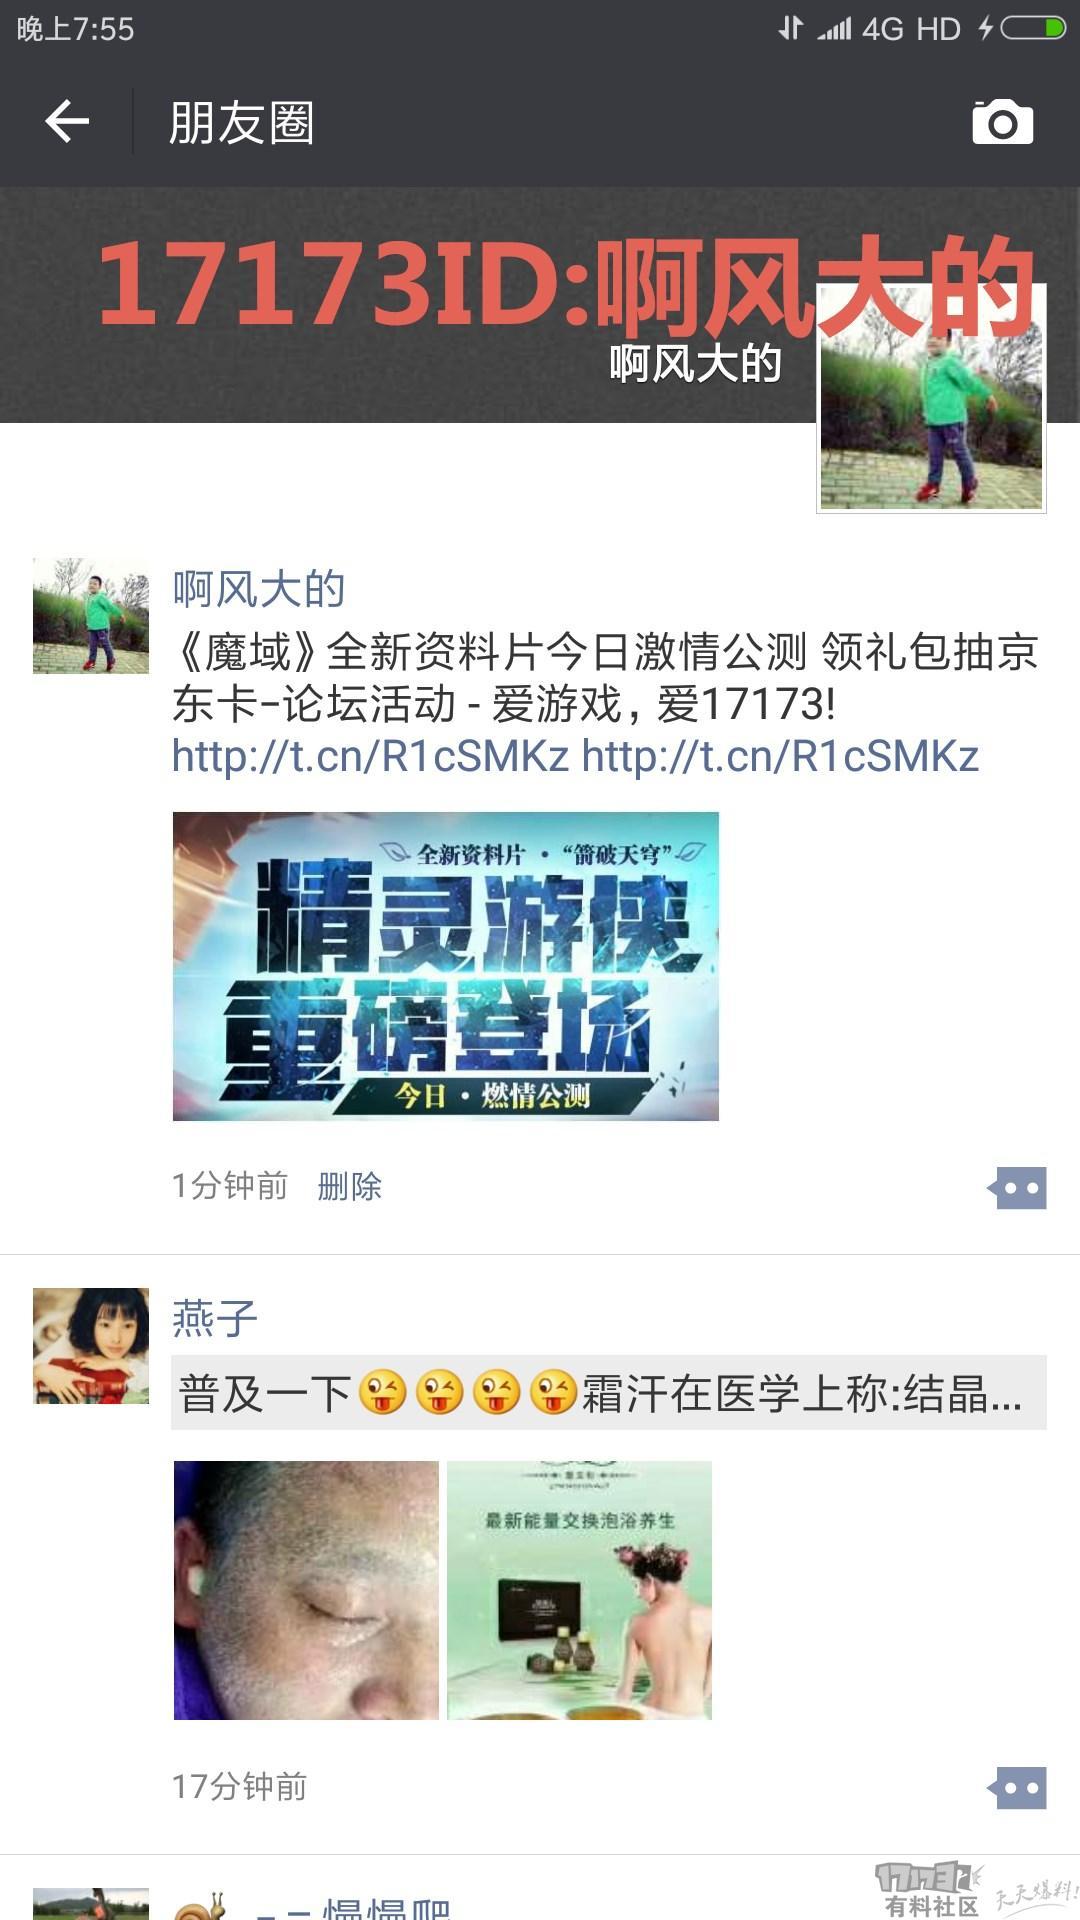 Screenshot_2018-05-28-19-55-12-806_com.tencent.mm_副本.jpg